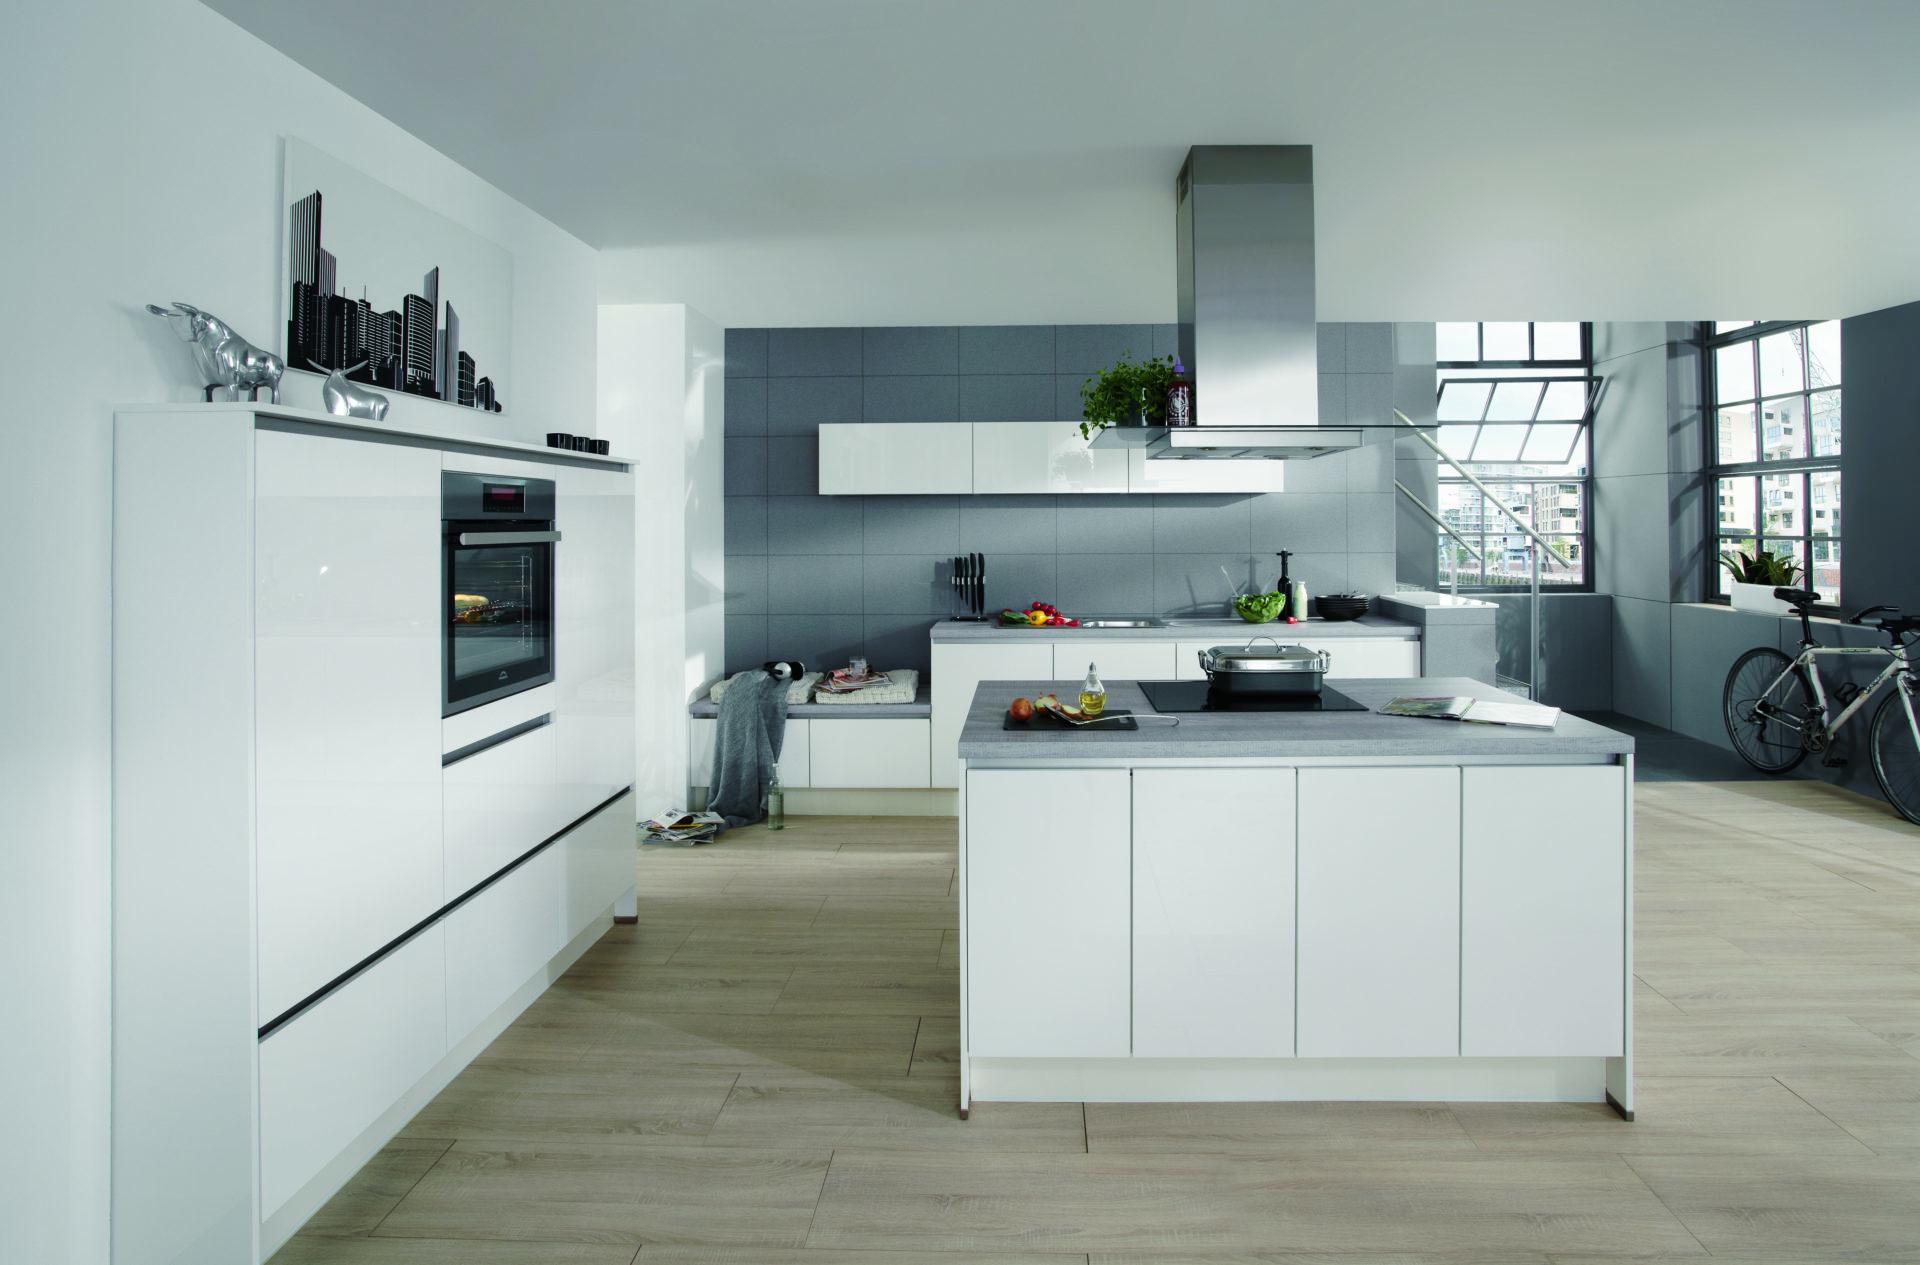 Design Keuken : Moderne keukens met strak lijnenspel. Hoogglans keuken ...